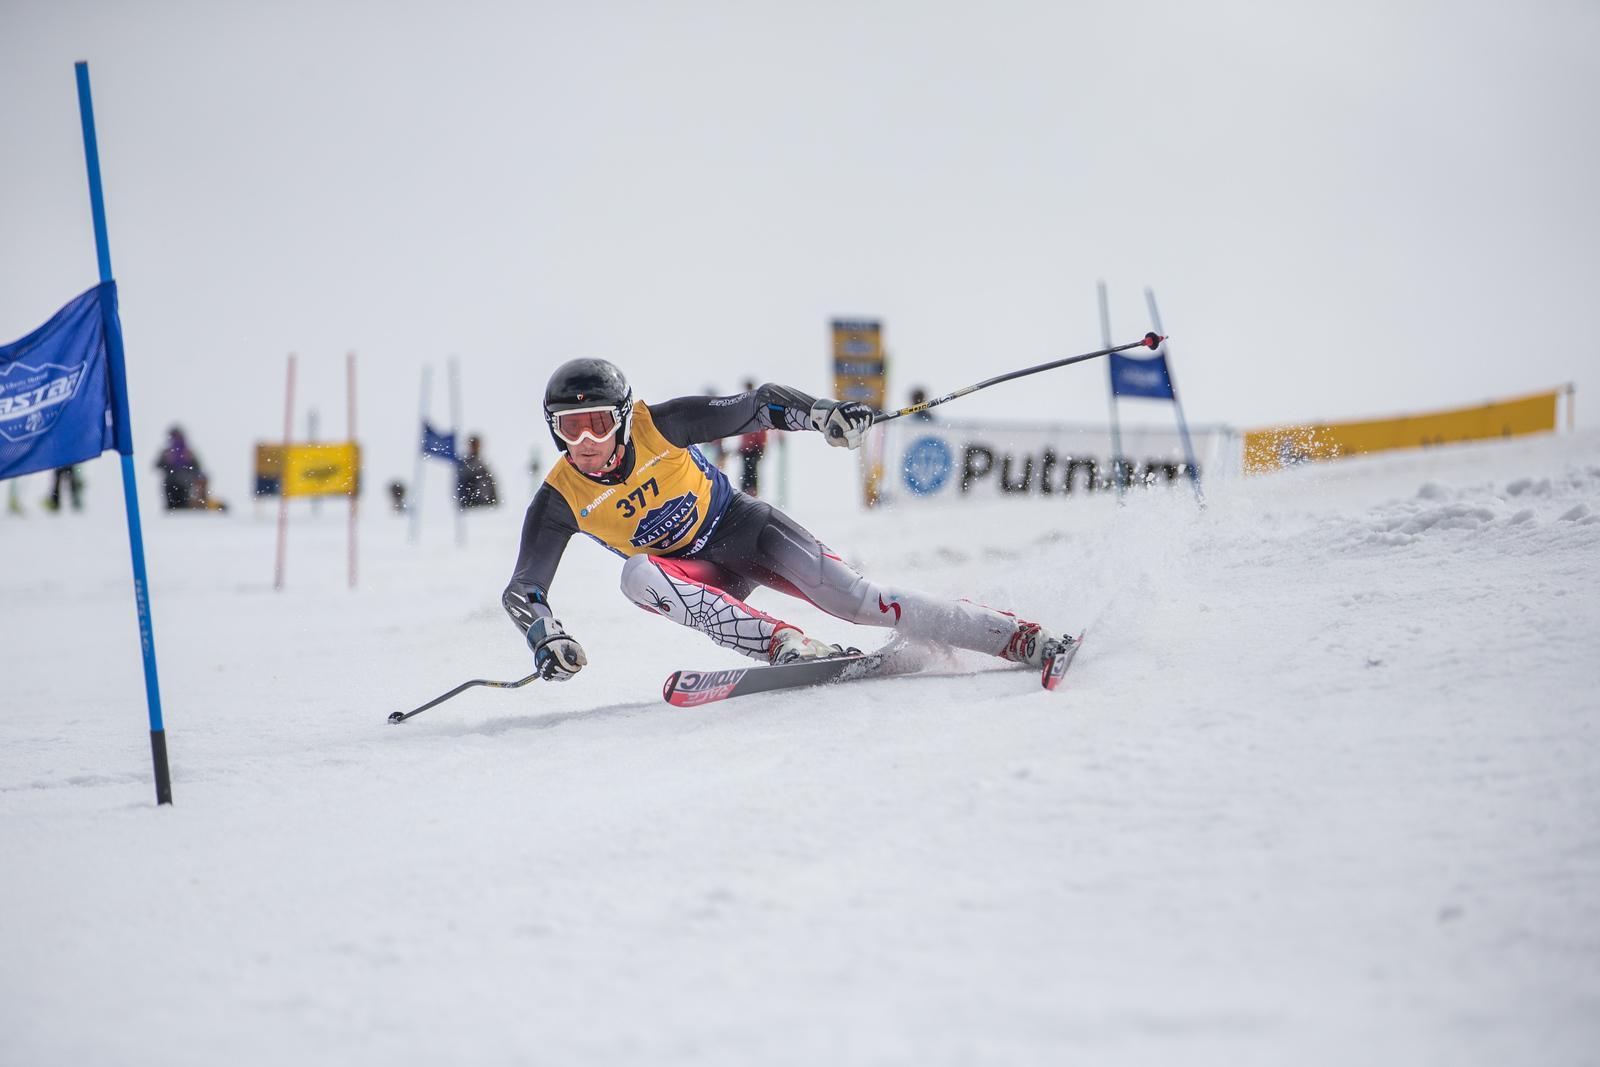 2017 NASTAR National Championships -  March 24, 2017